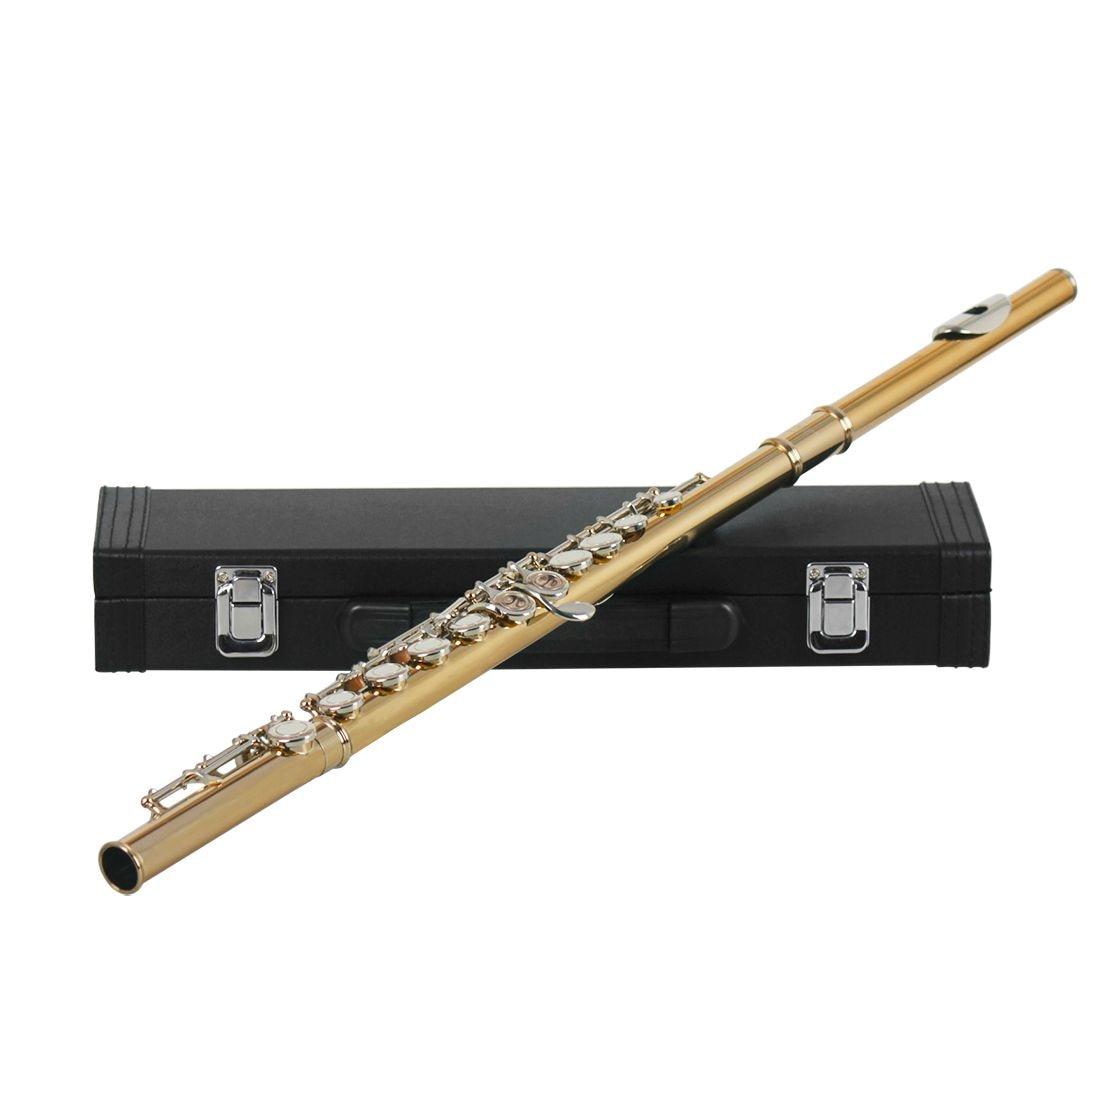 купить New Western Concert Flute 16 Holes C Key Cupronickel Musical Instrument with Cleaning Cloth Stick Gloves Screwdriver Gold по цене 4227.4 рублей